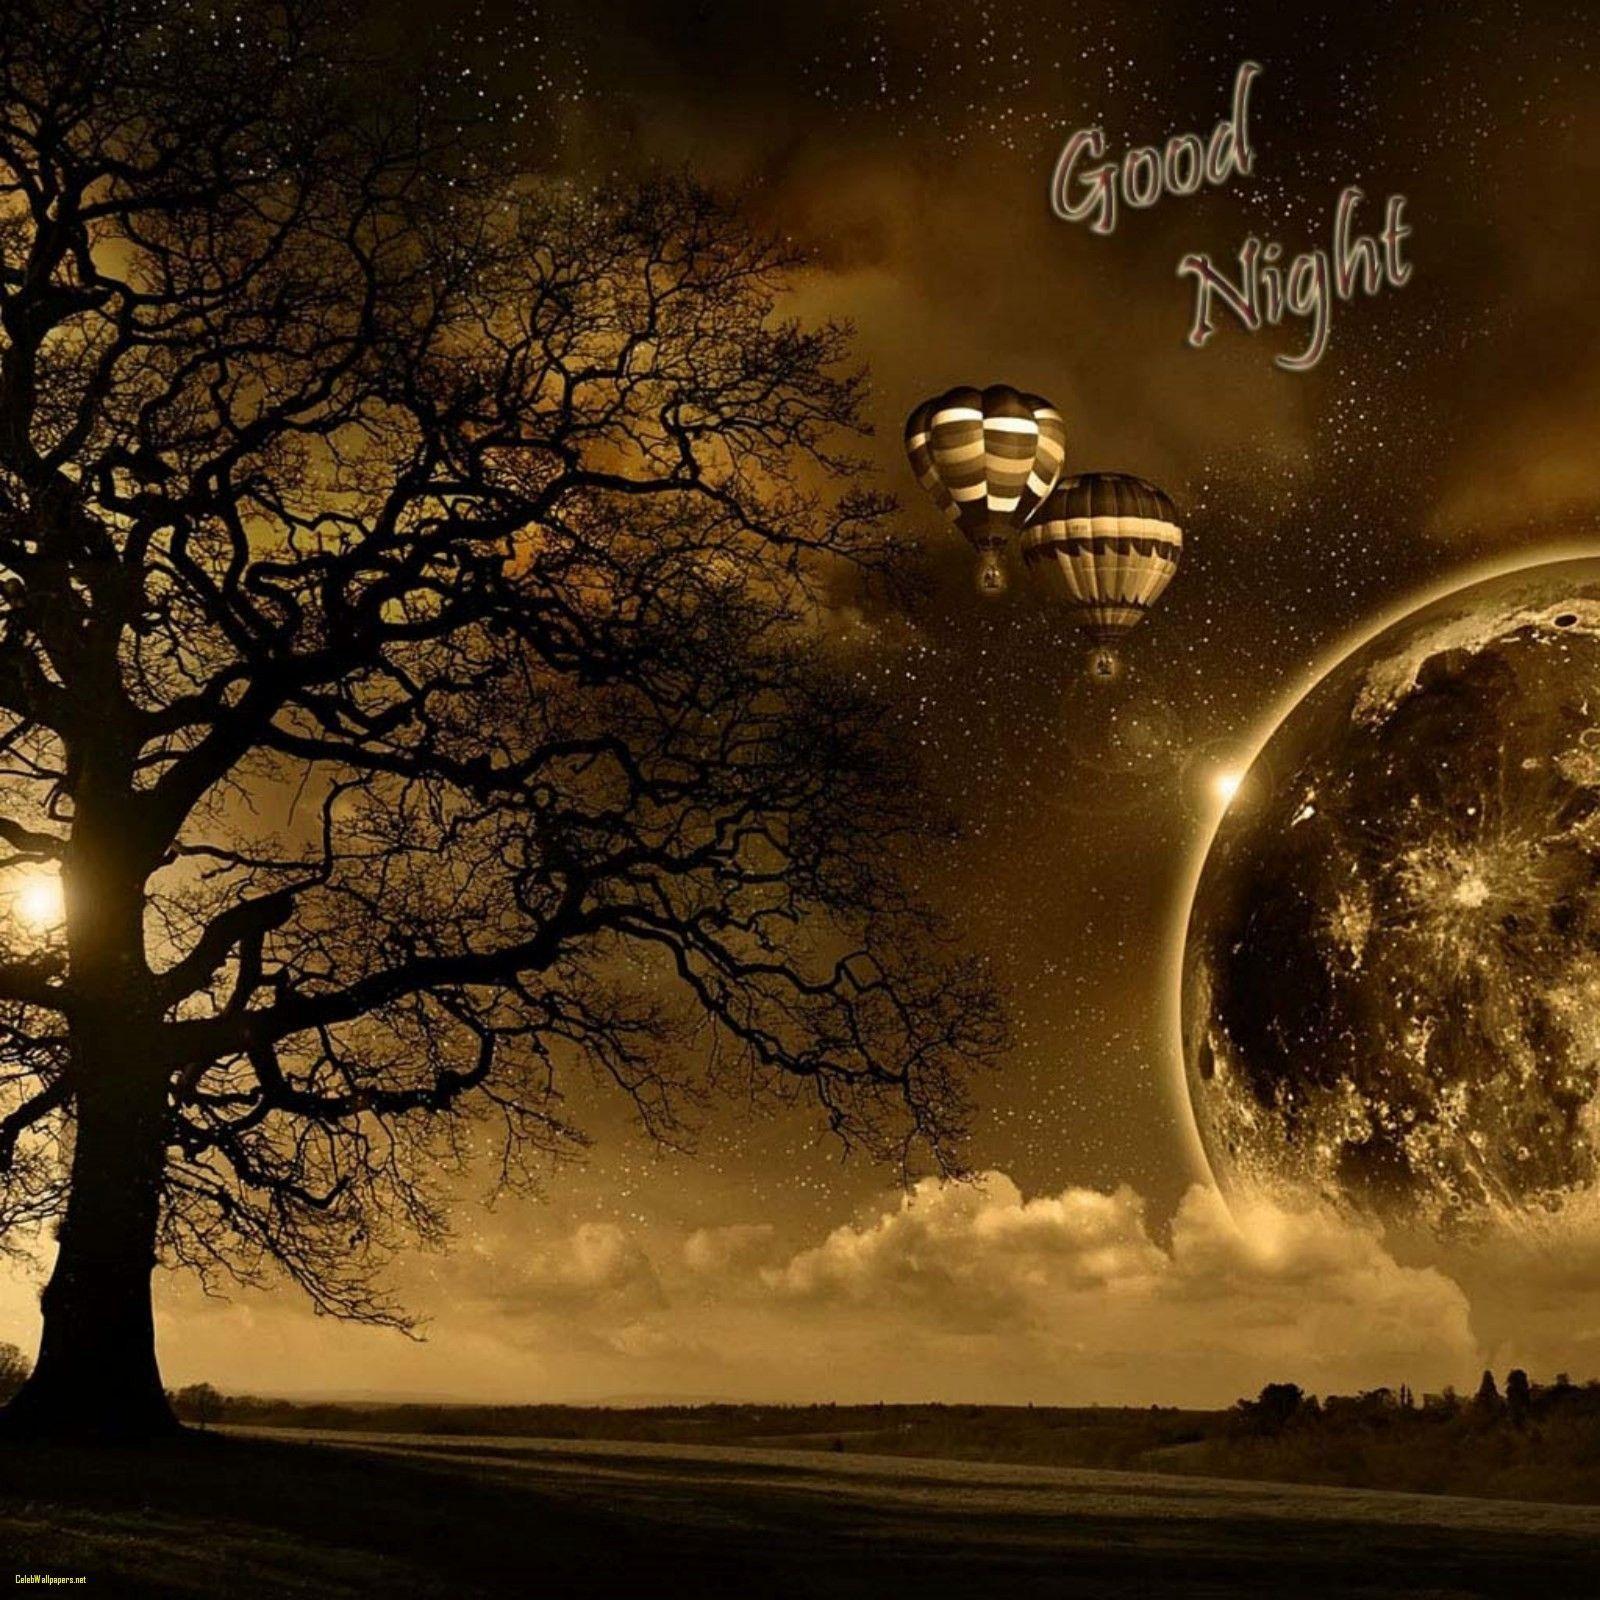 Good Night Wallpaper: Good Night HD Wallpapers